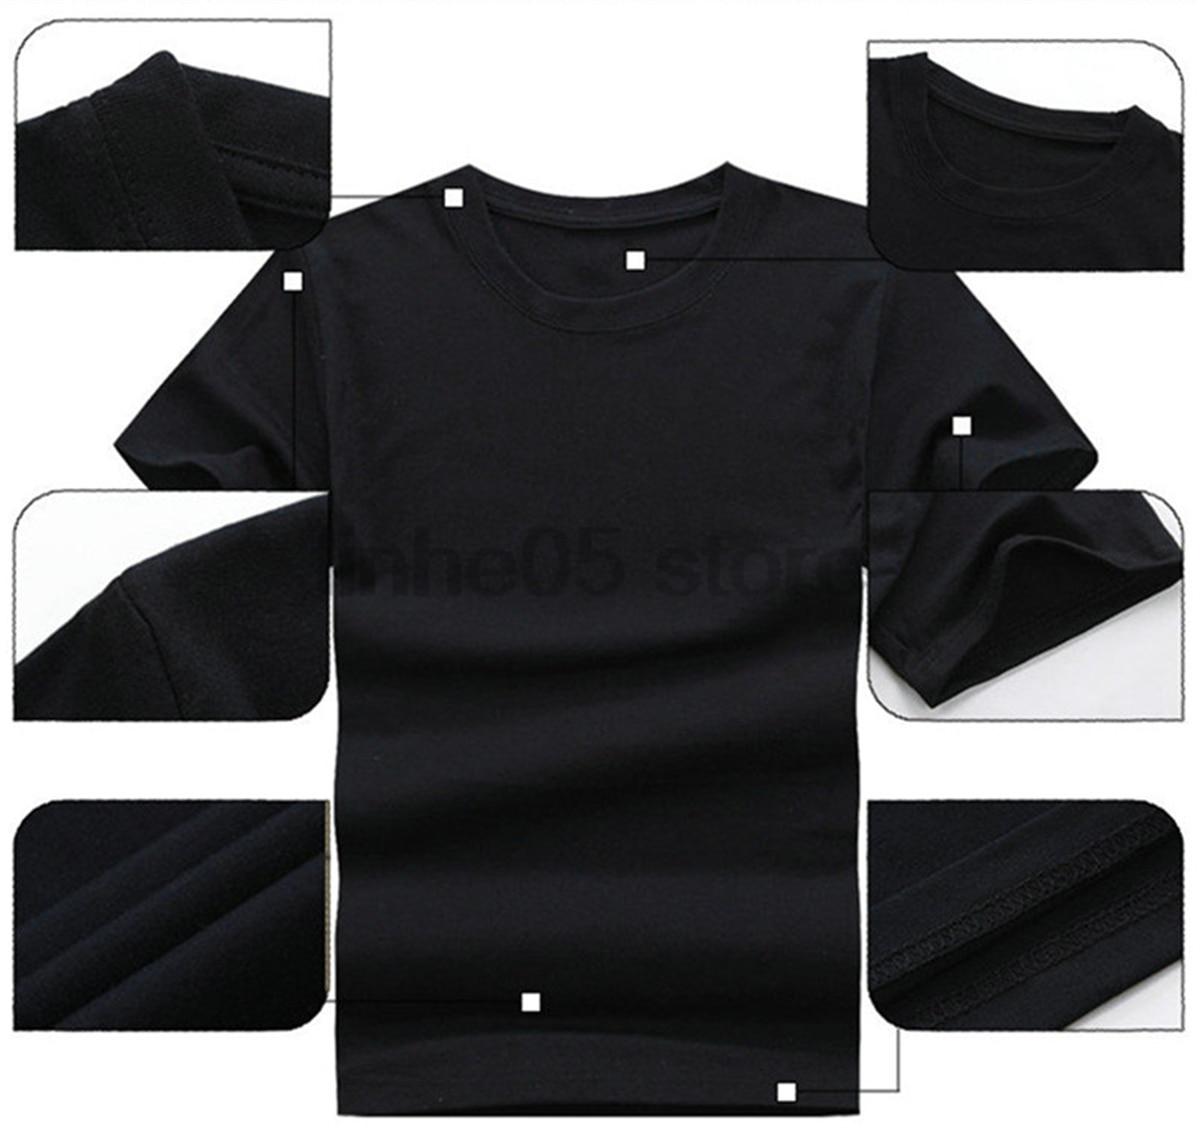 GILDAN How Do You Feel T-Shirt Dress female T-shirt